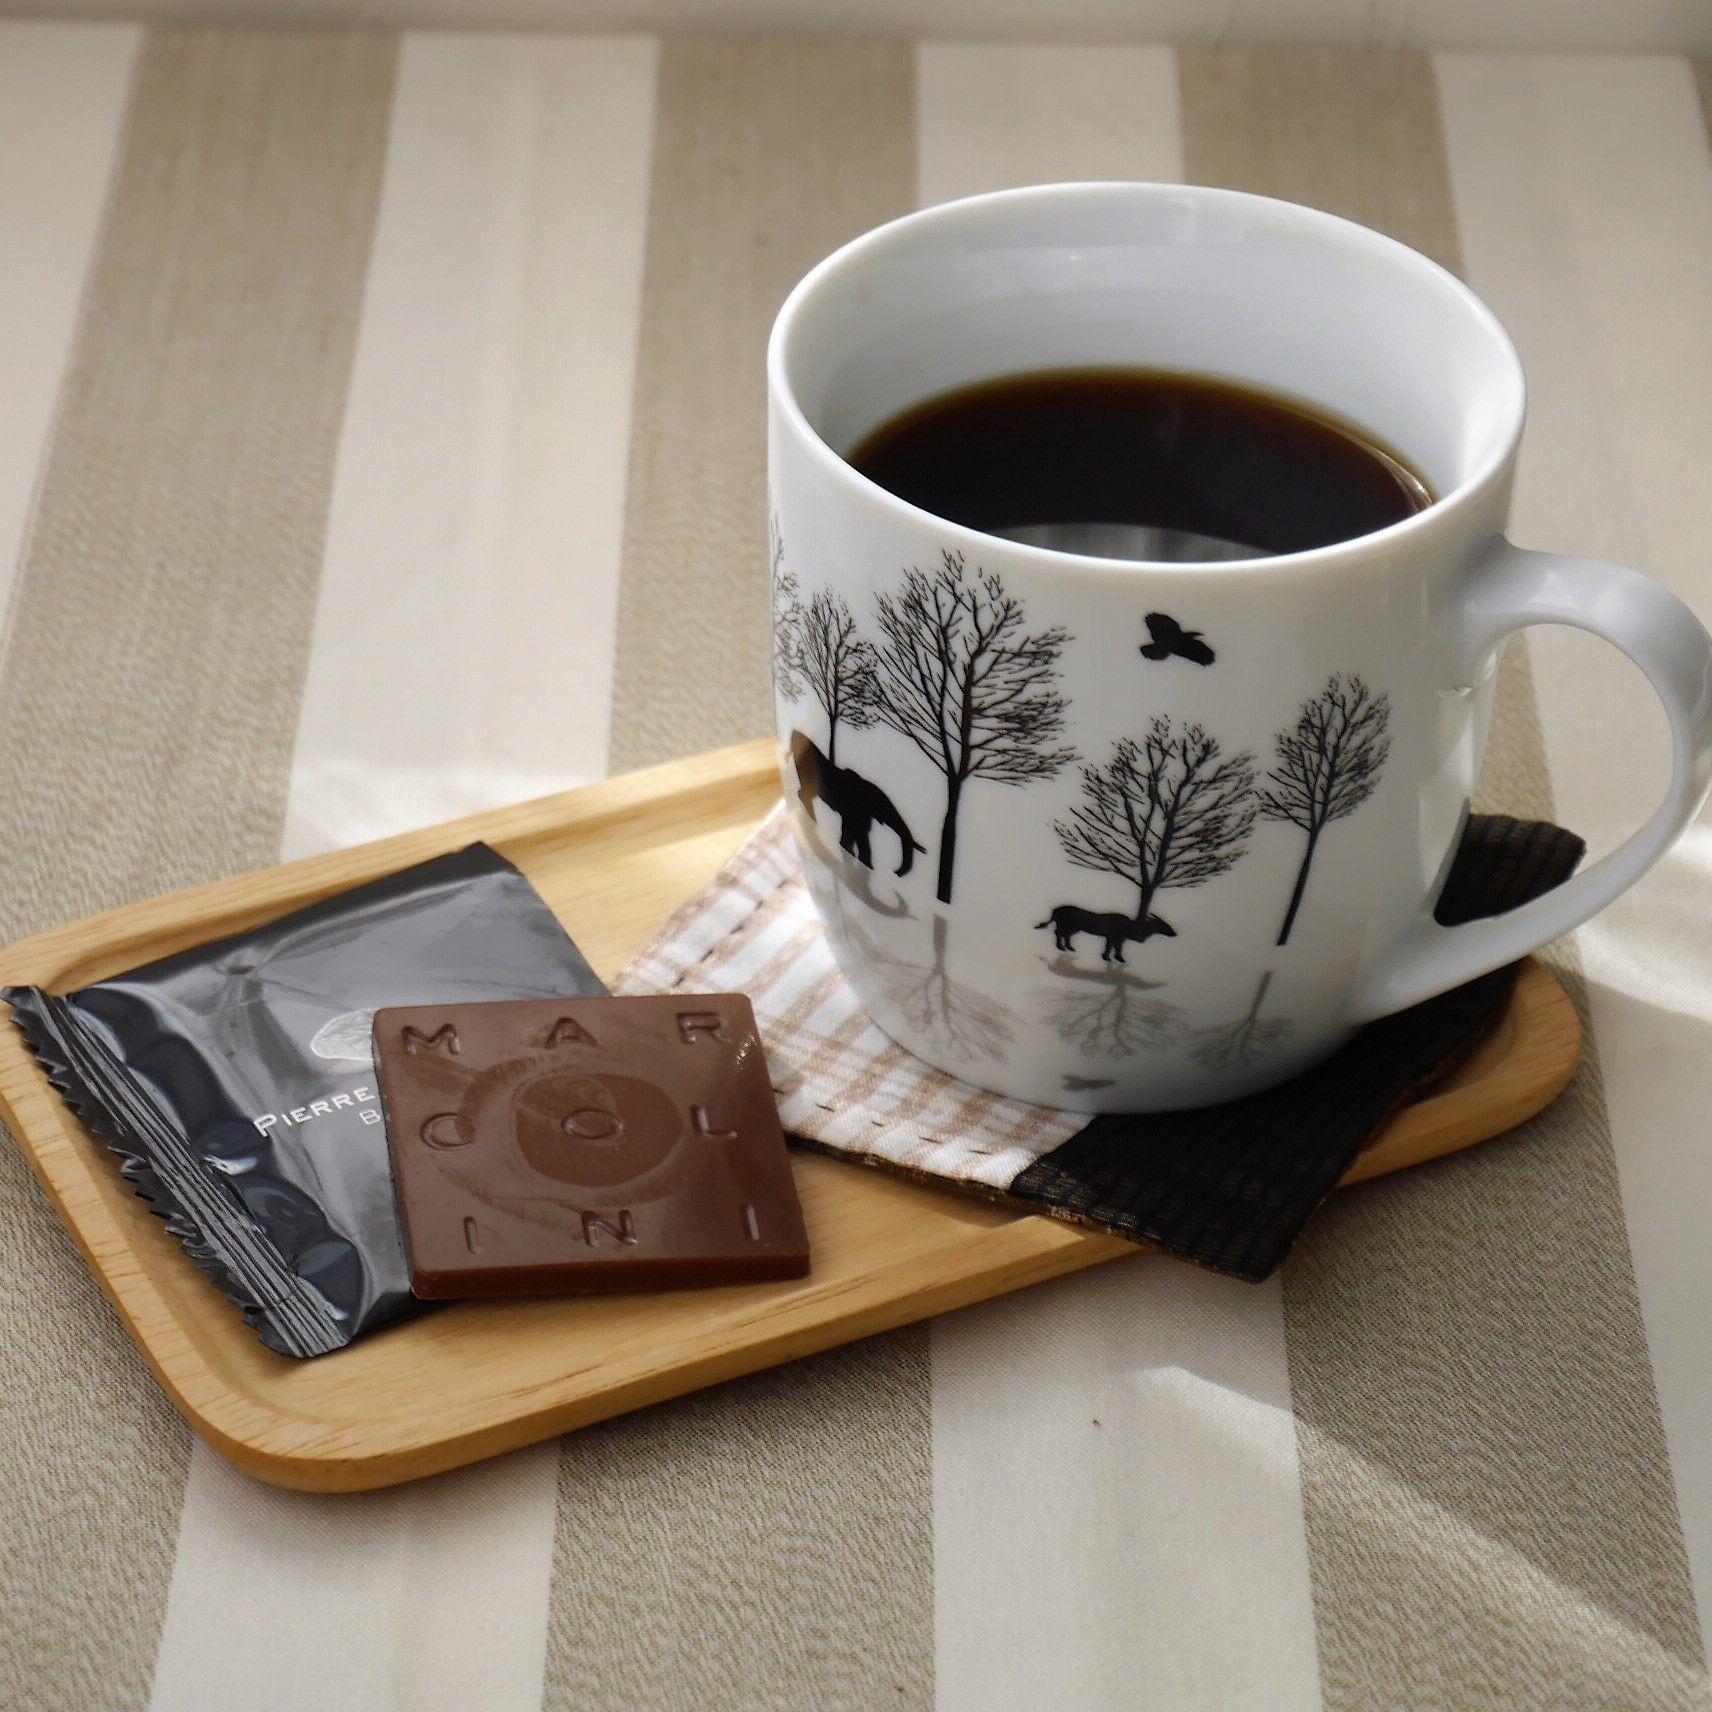 dell座談会_チョコレート&コーヒー